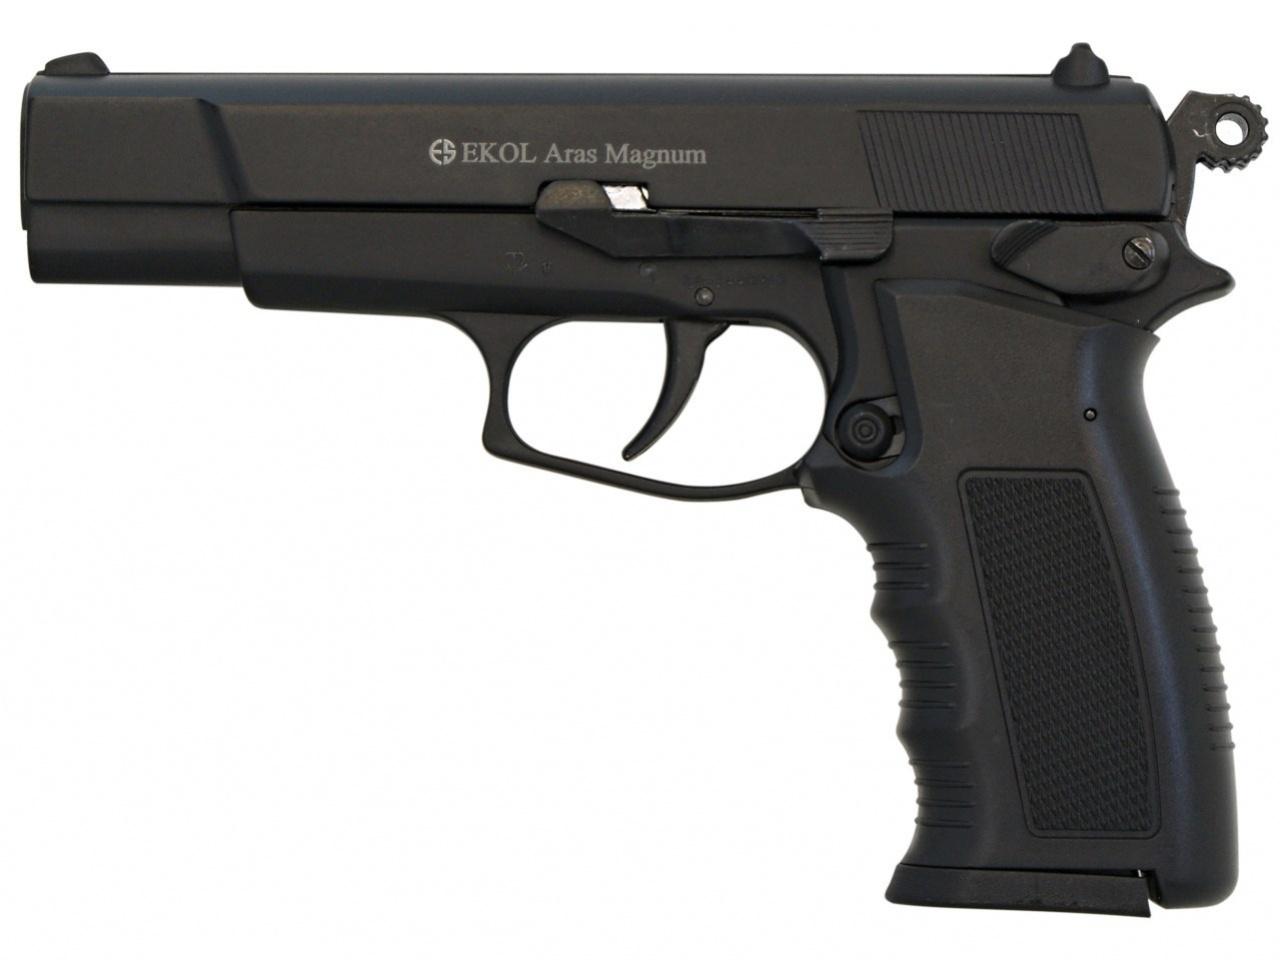 Plynová pistole Ekol Aras Magnum černá cal.9mm